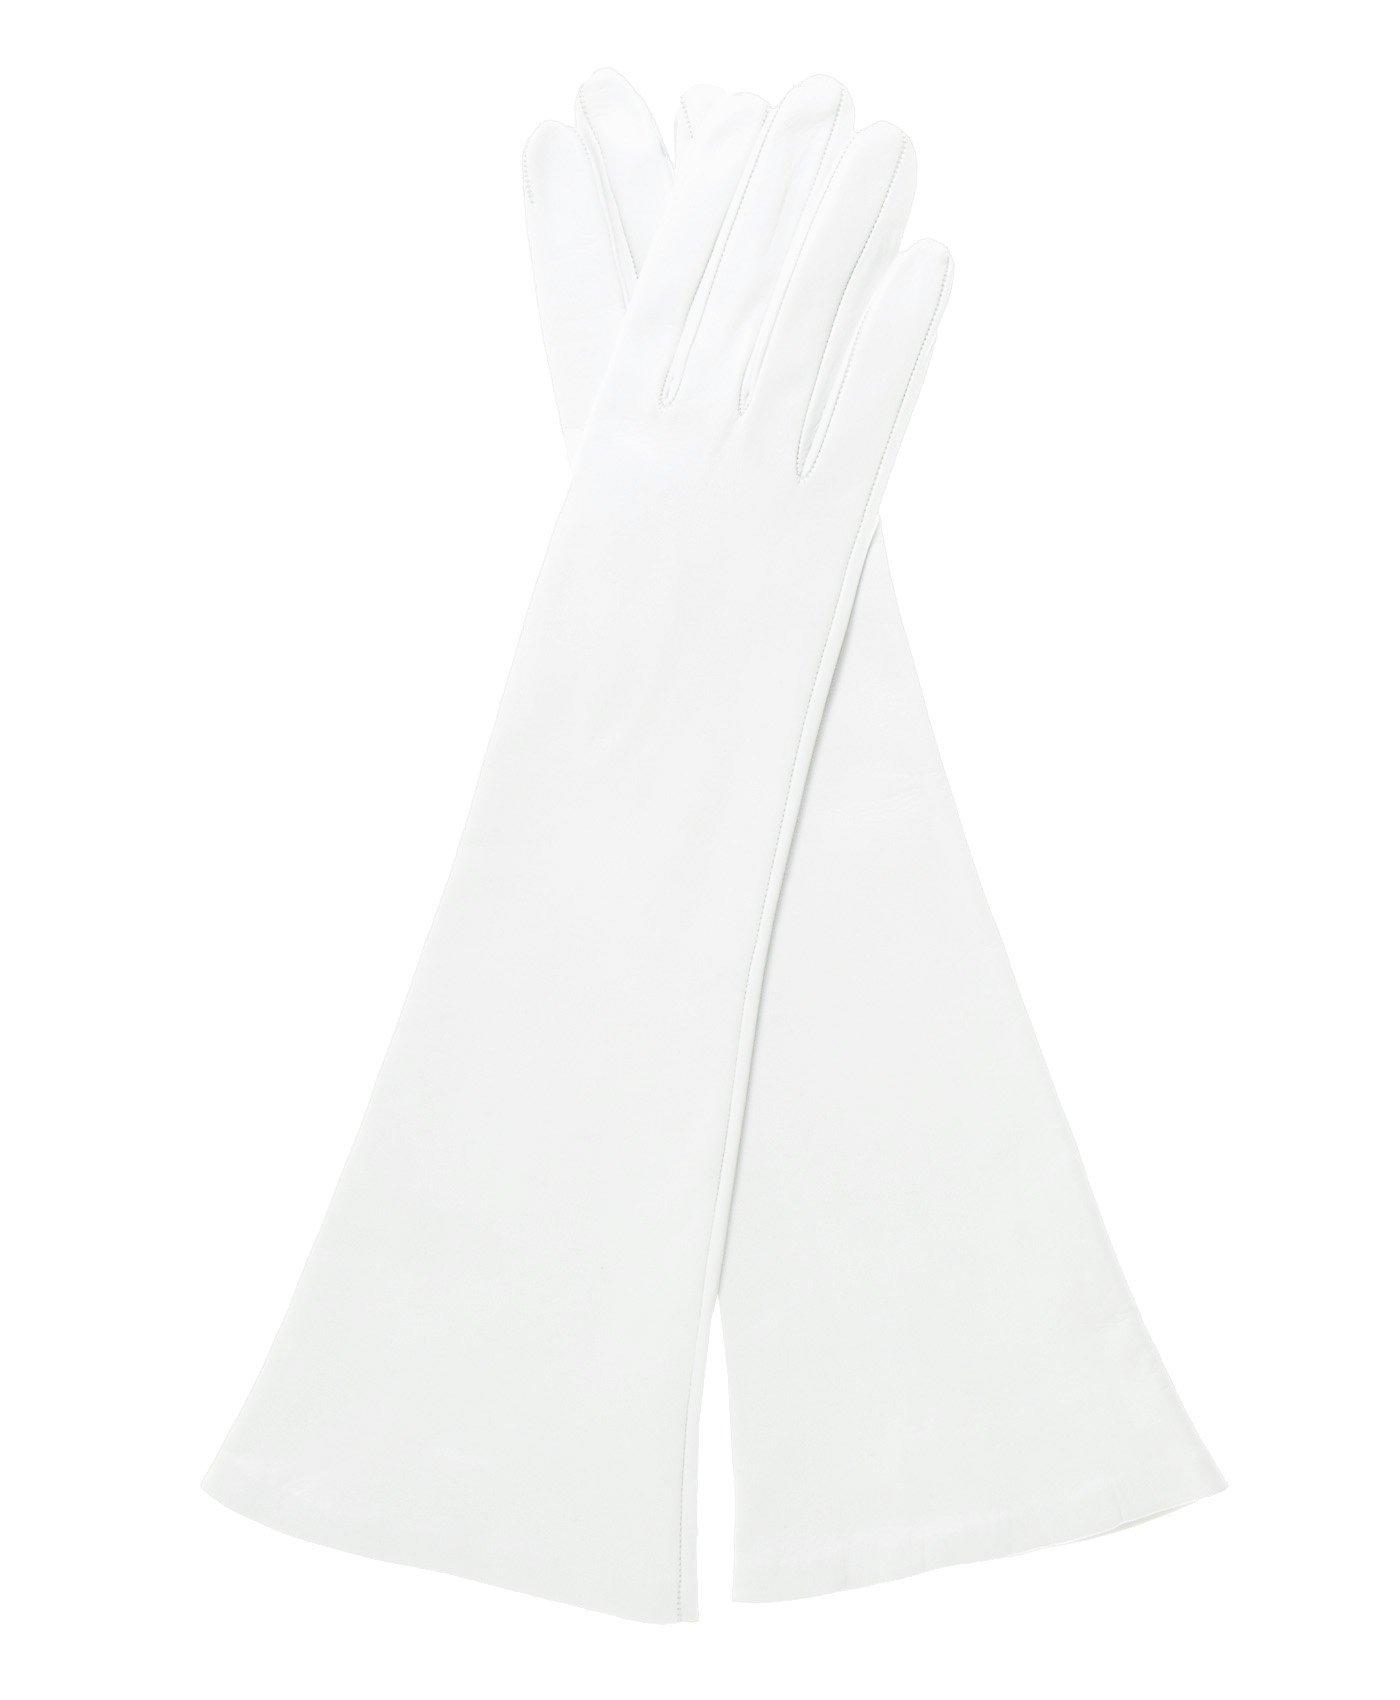 Fratelli Orsini Women's Italian Silk Lined 6-Button Length Bridal Gloves Size 7 1/2 Color White by Fratelli Orsini (Image #3)